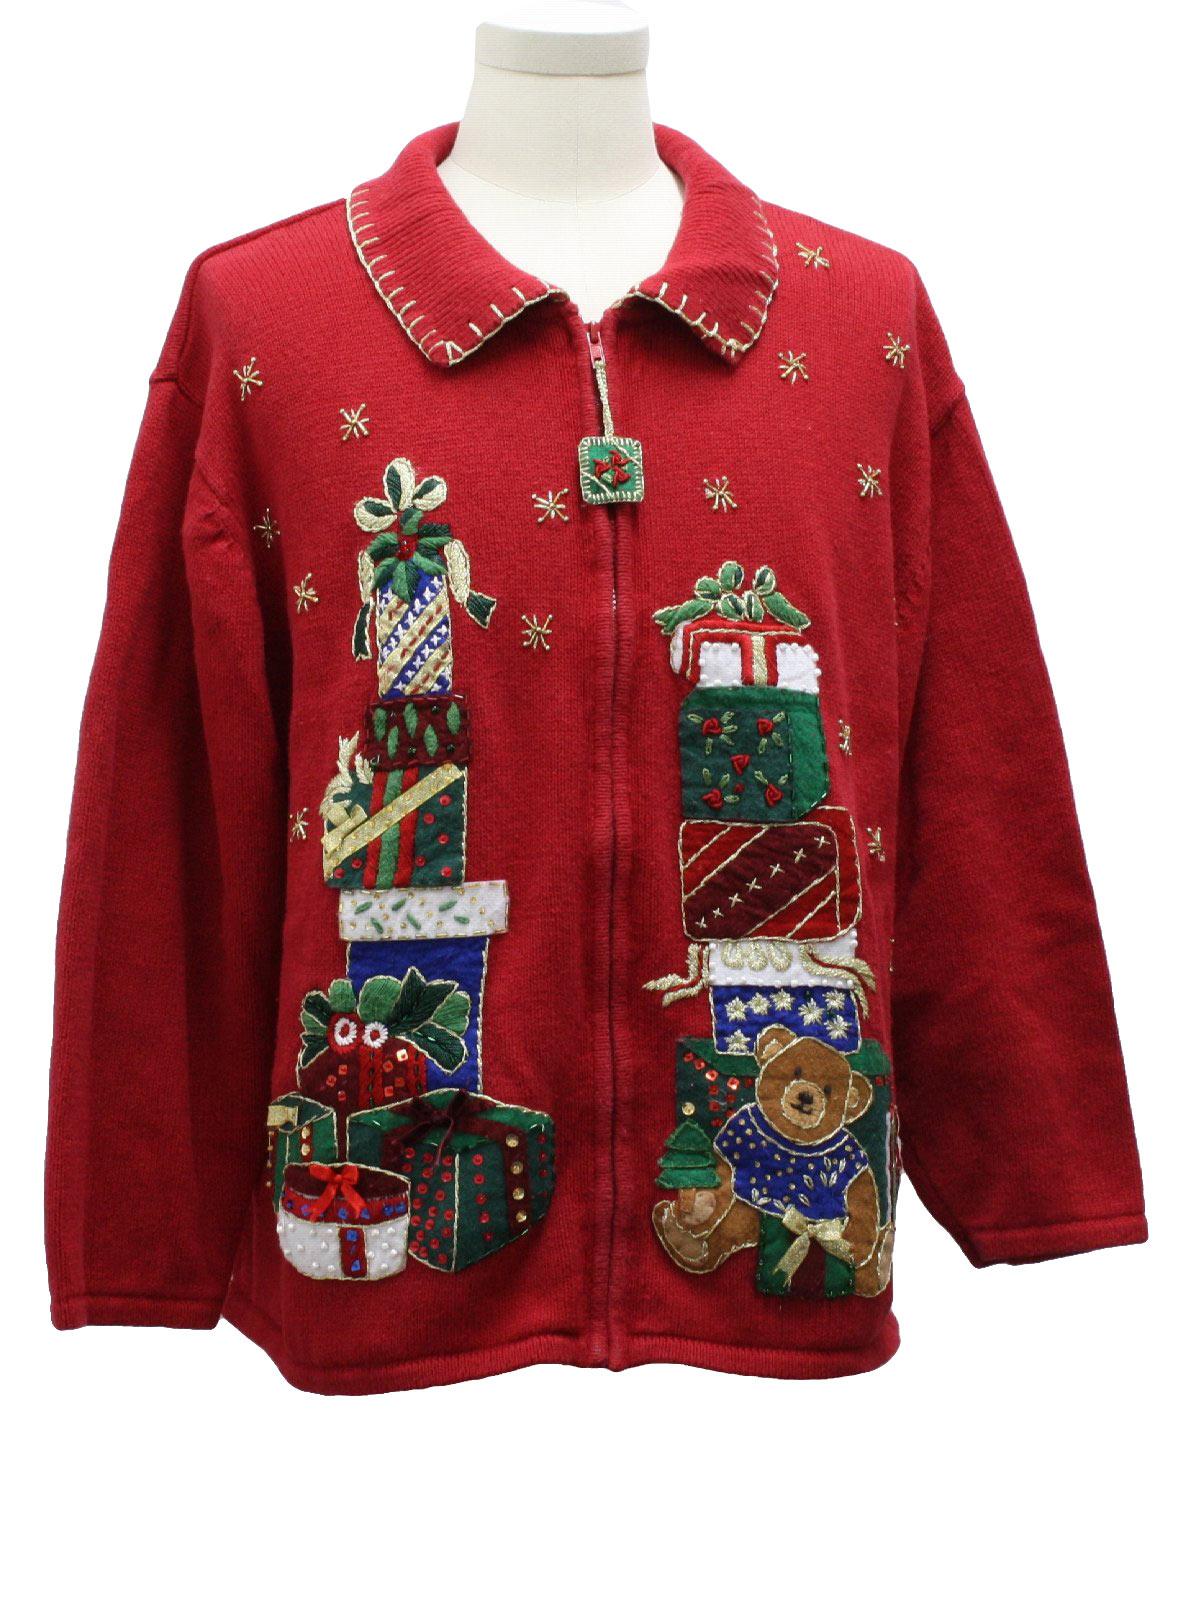 Ugly christmas sweater tiara international unisex red for Over the top ugly christmas sweaters